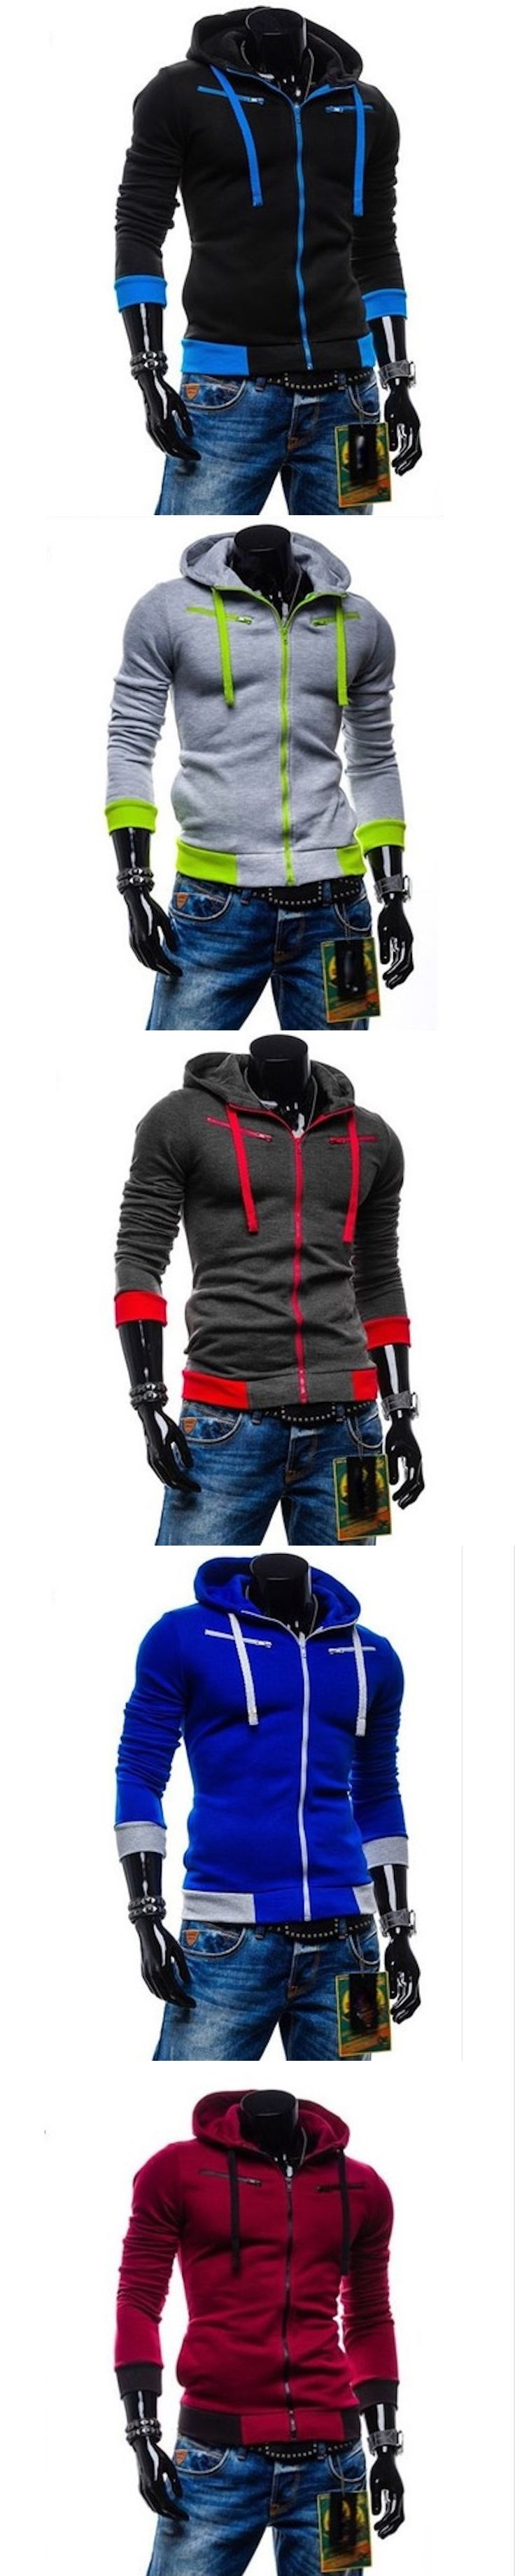 2017 New Mens Hoodies and Sweatshirts Zipper Hooded Sweatshirts Male Clothing Fashion Military Hoody For Men Jacket 4XL